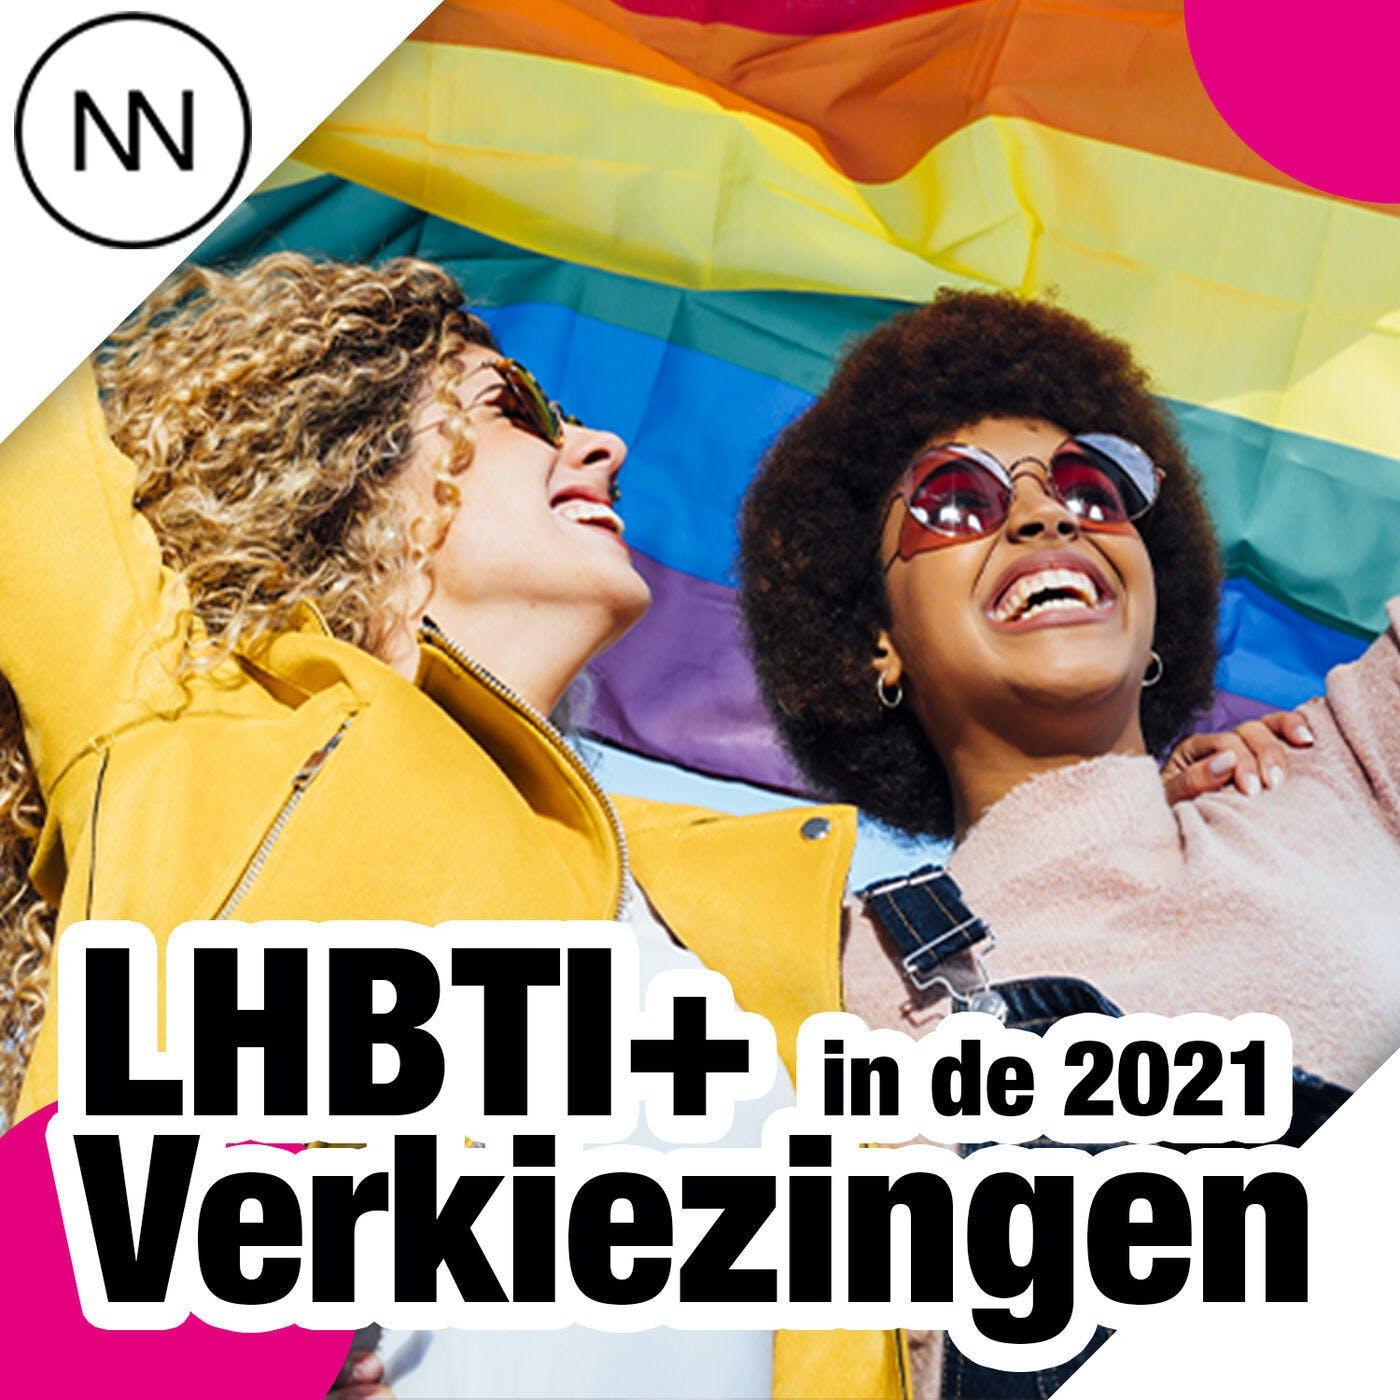 LHBTI+ in de 2021 Verkiezingen (bonus afl.)